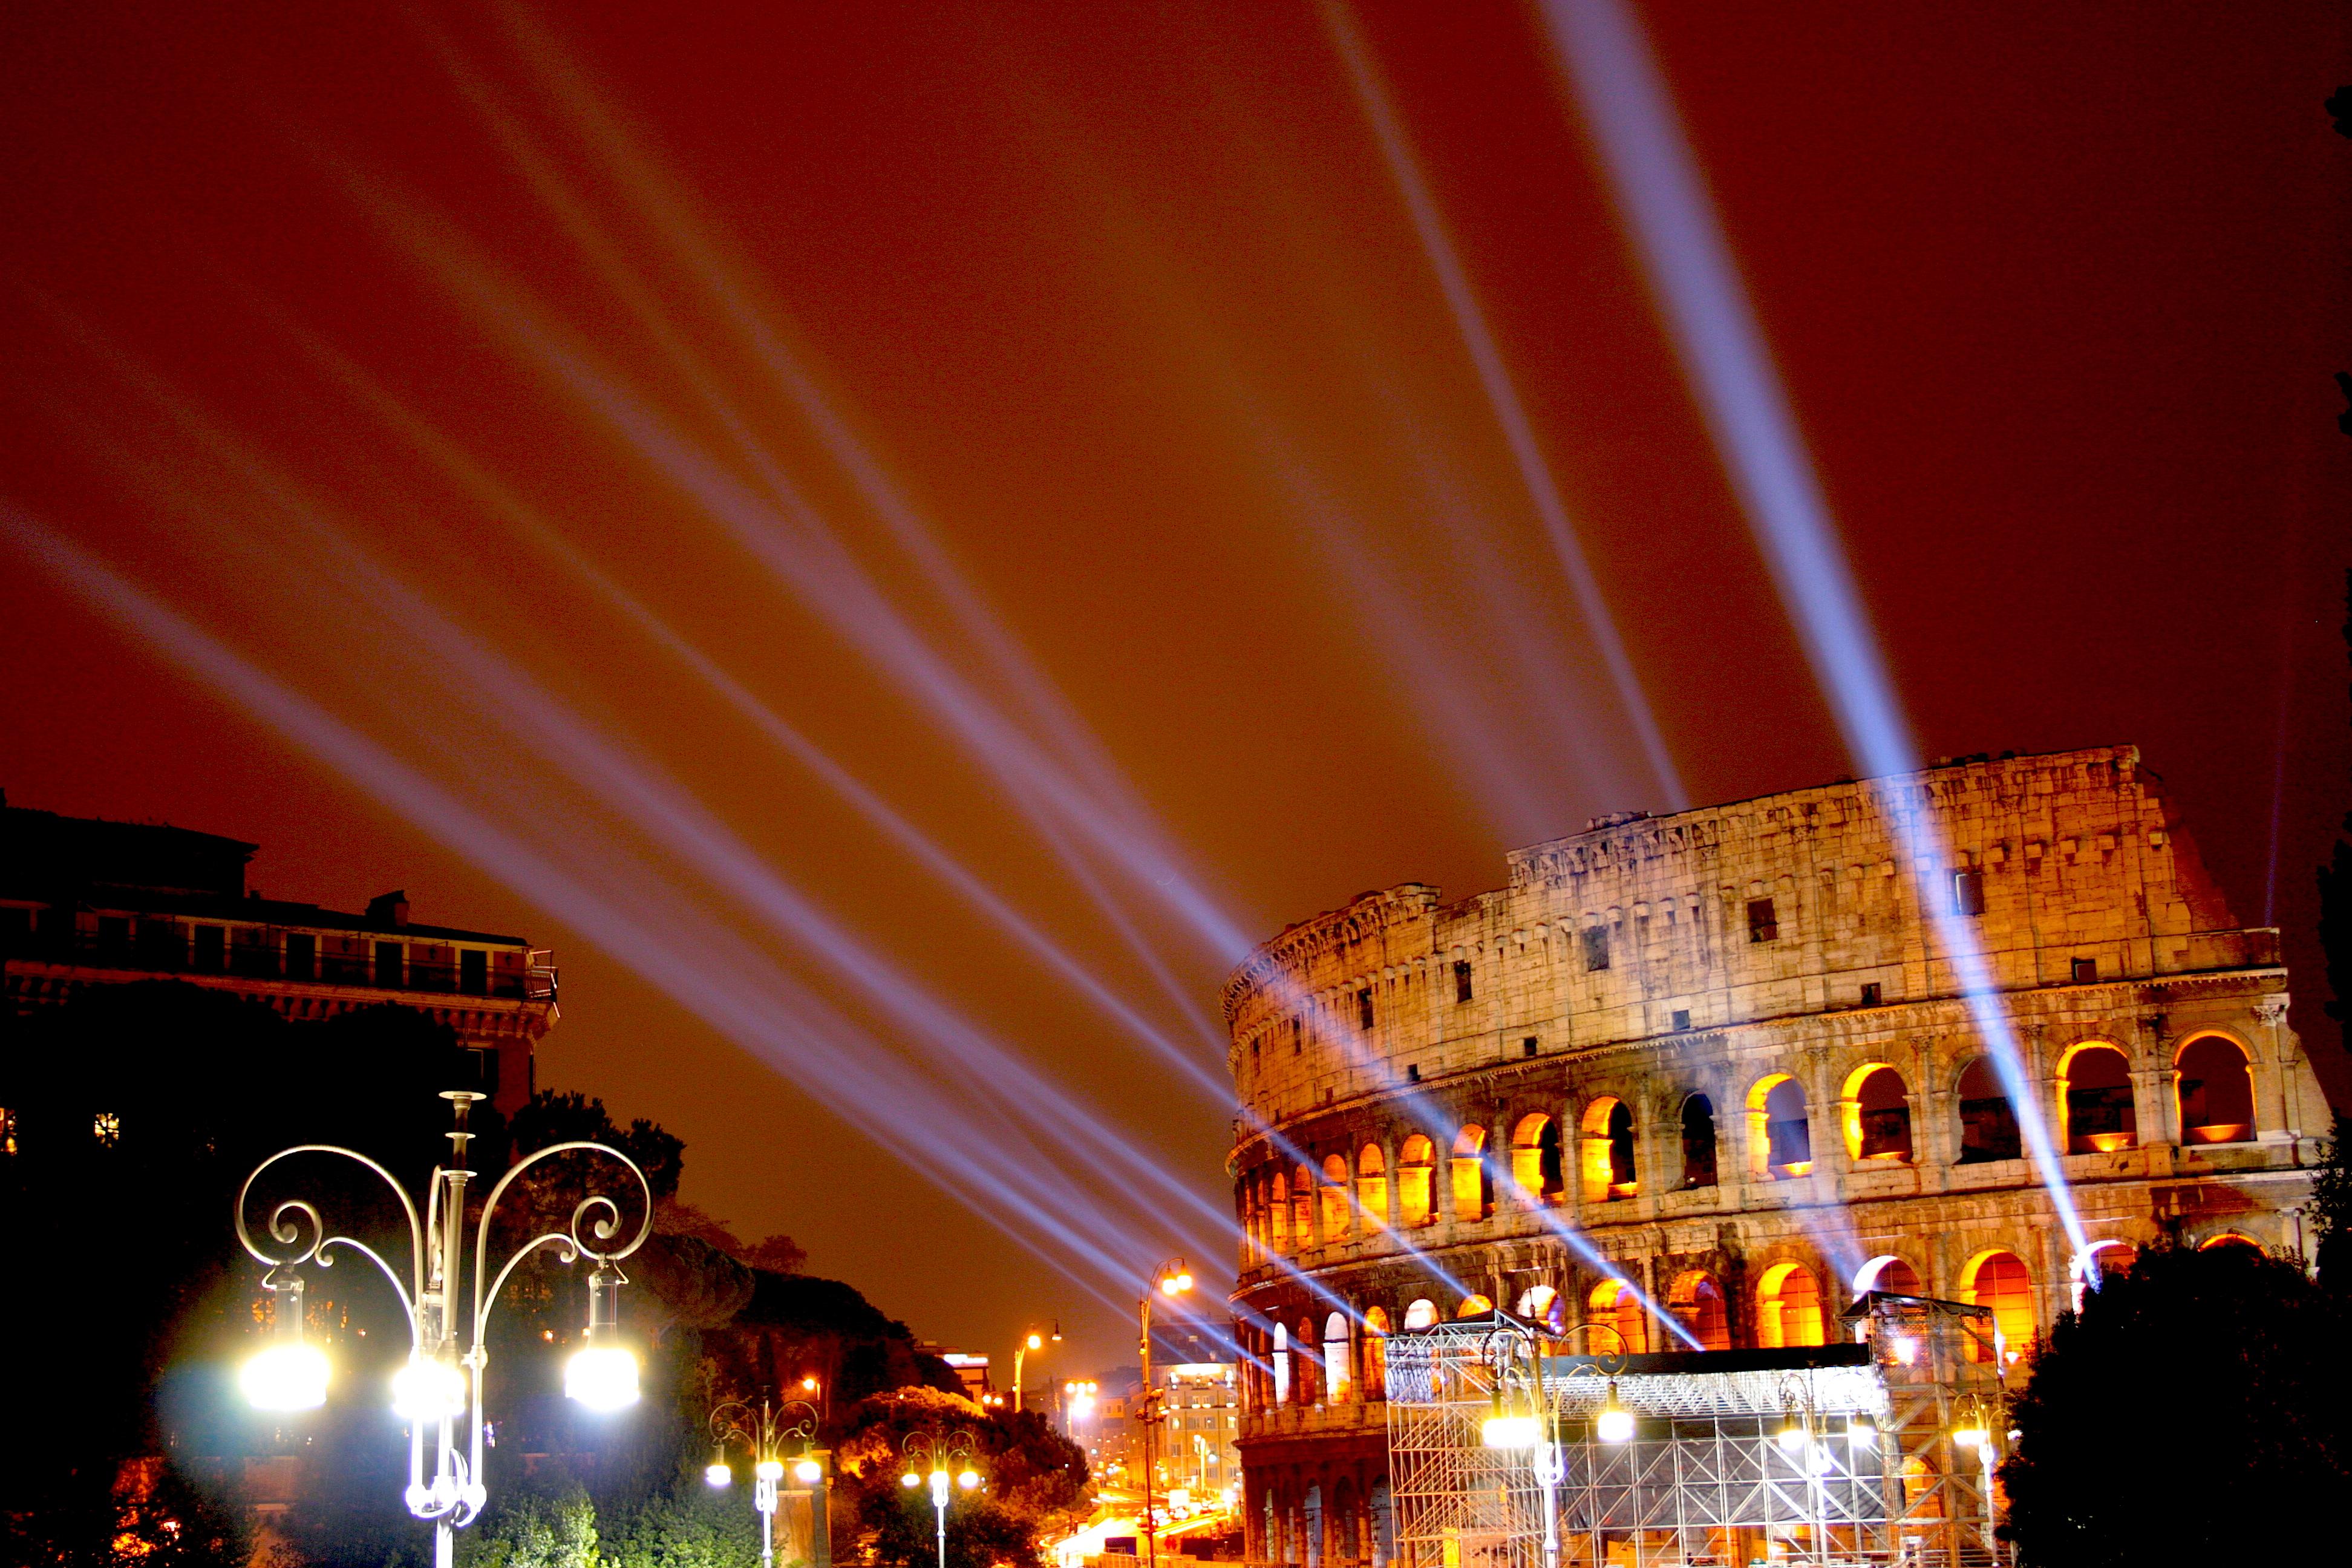 Colosseo 9.JPG